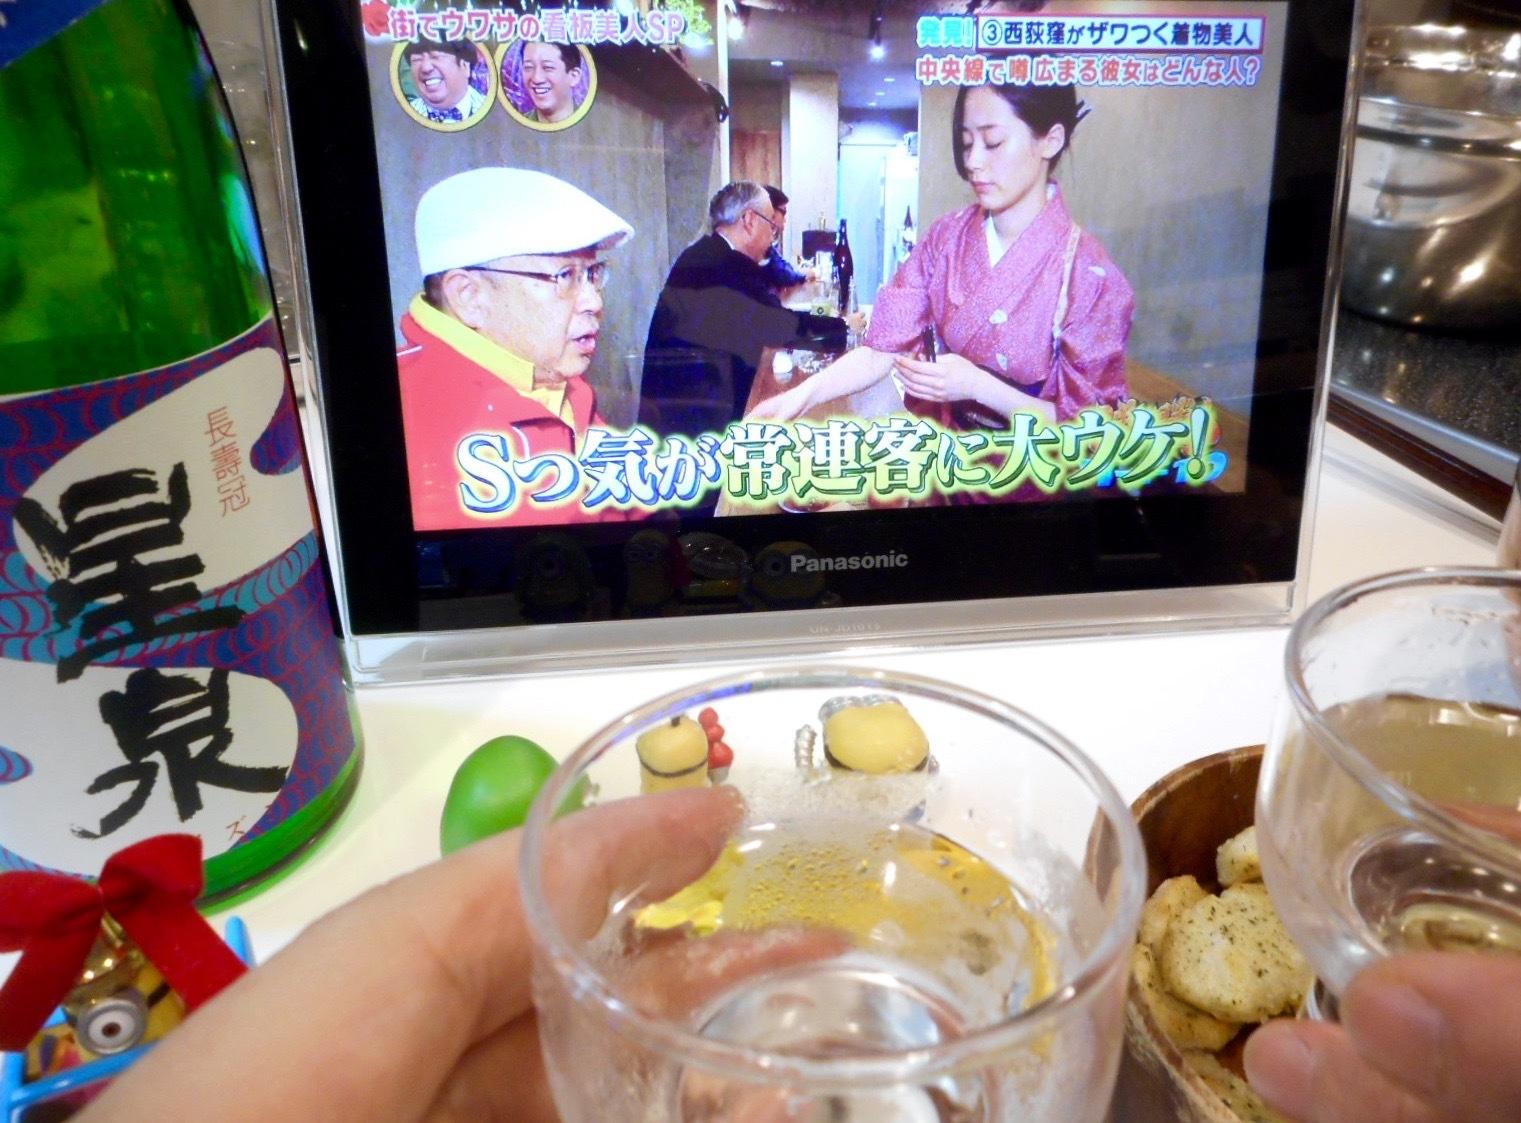 hoshiizumi_jungin7_28by11.jpg